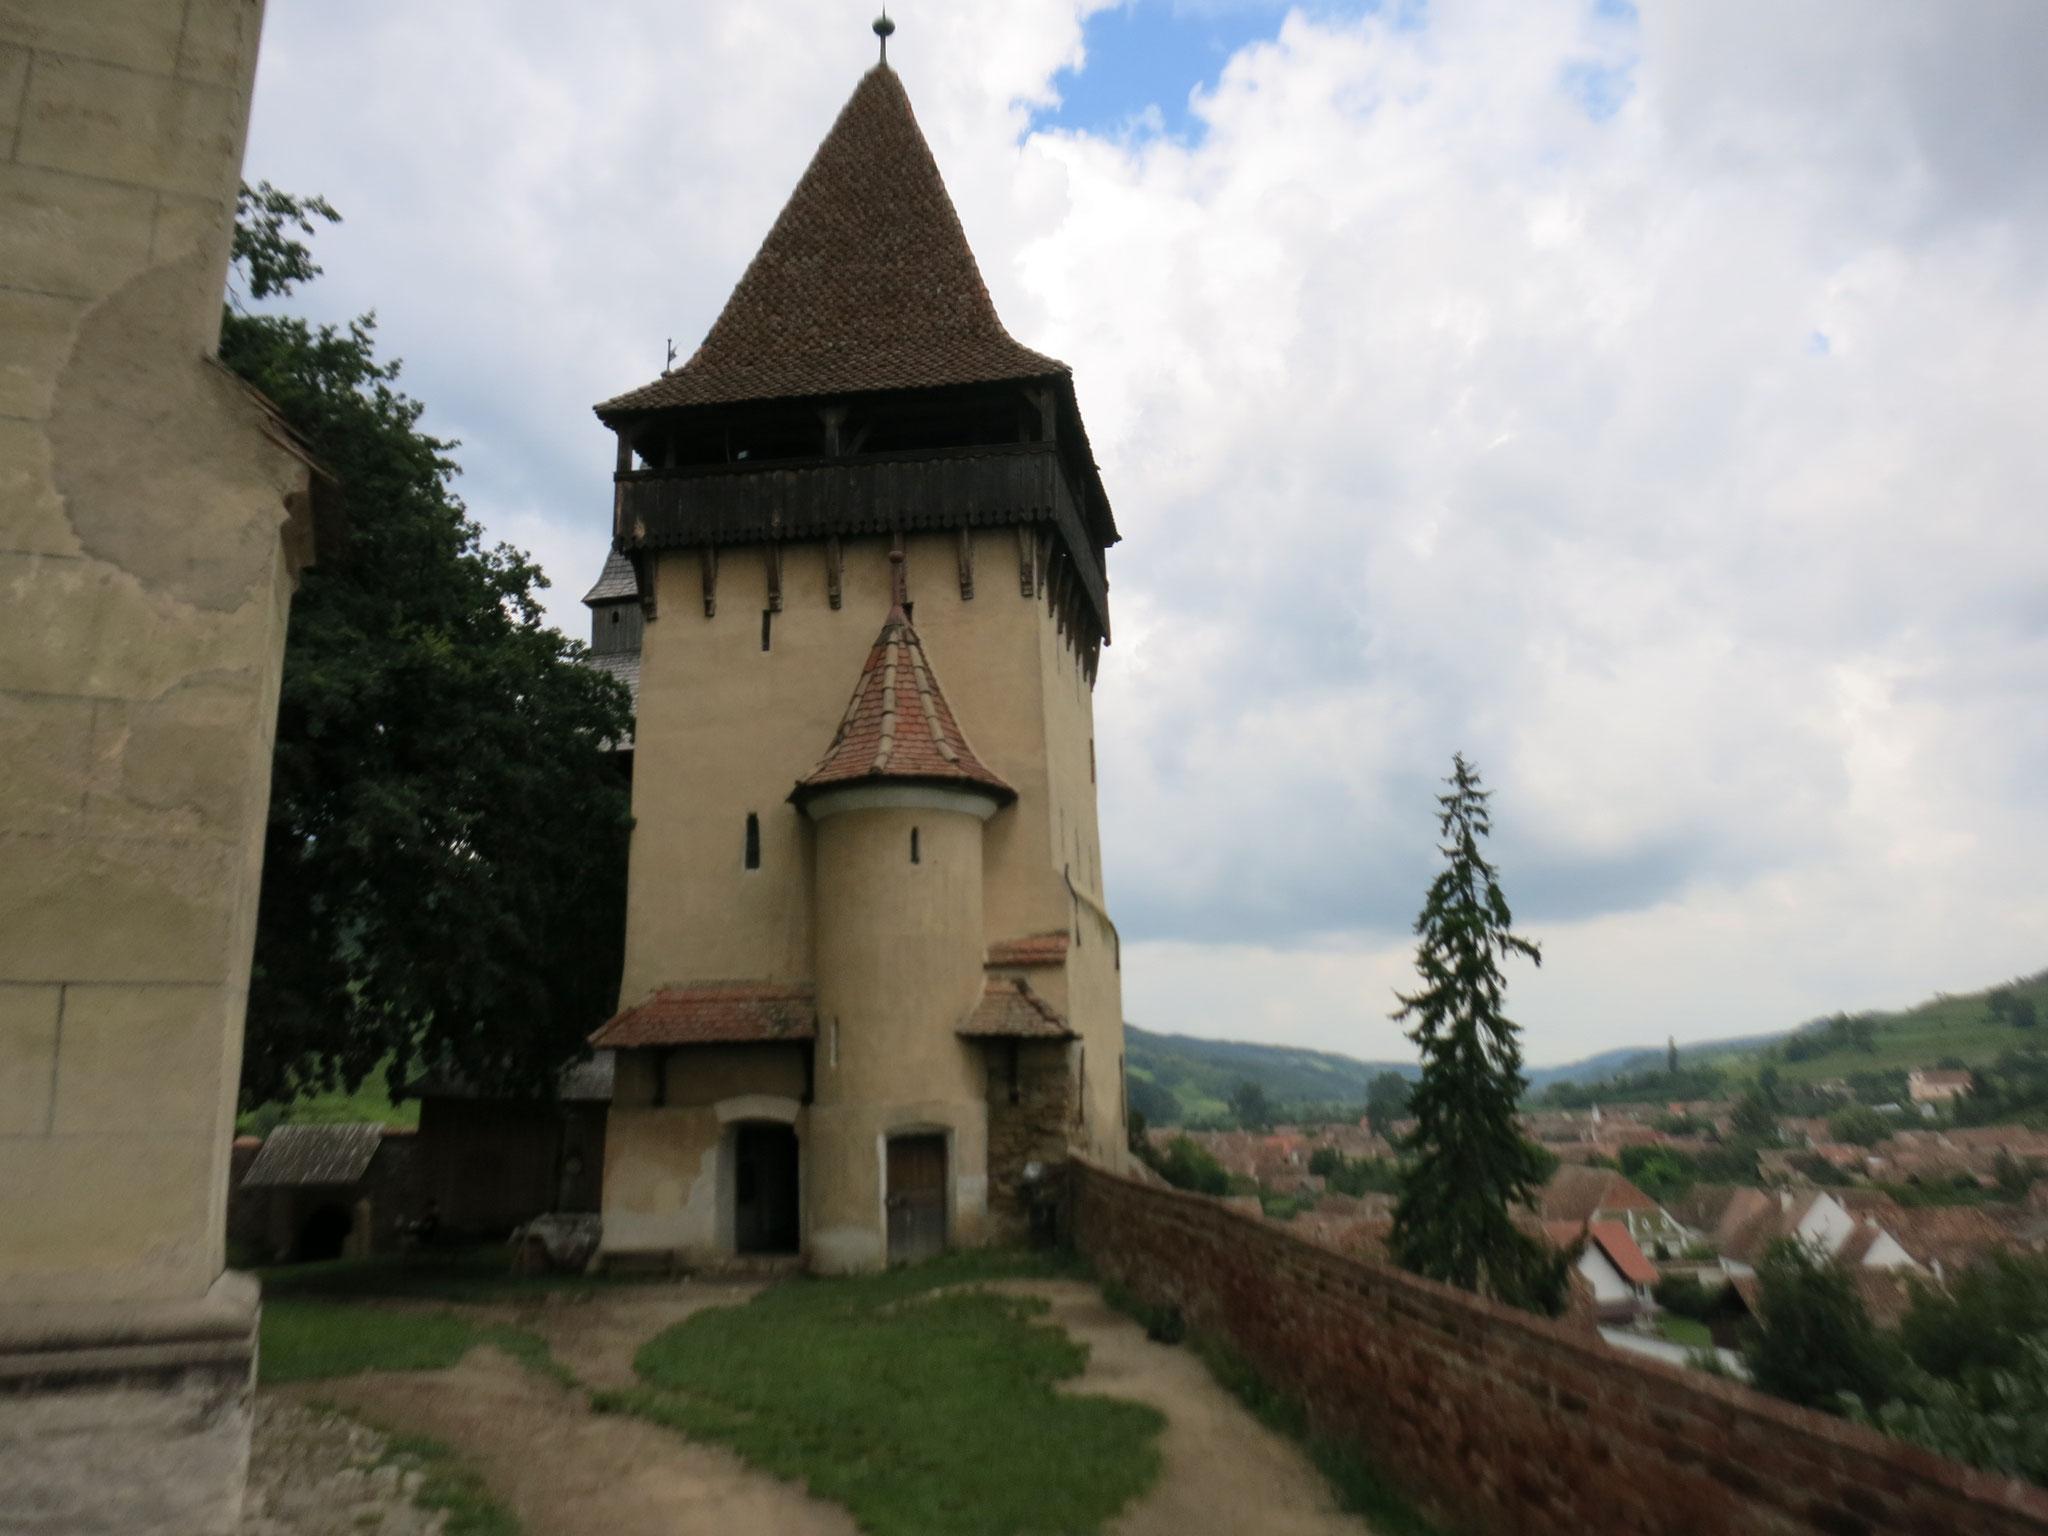 Torres de la iglesia de Biertan